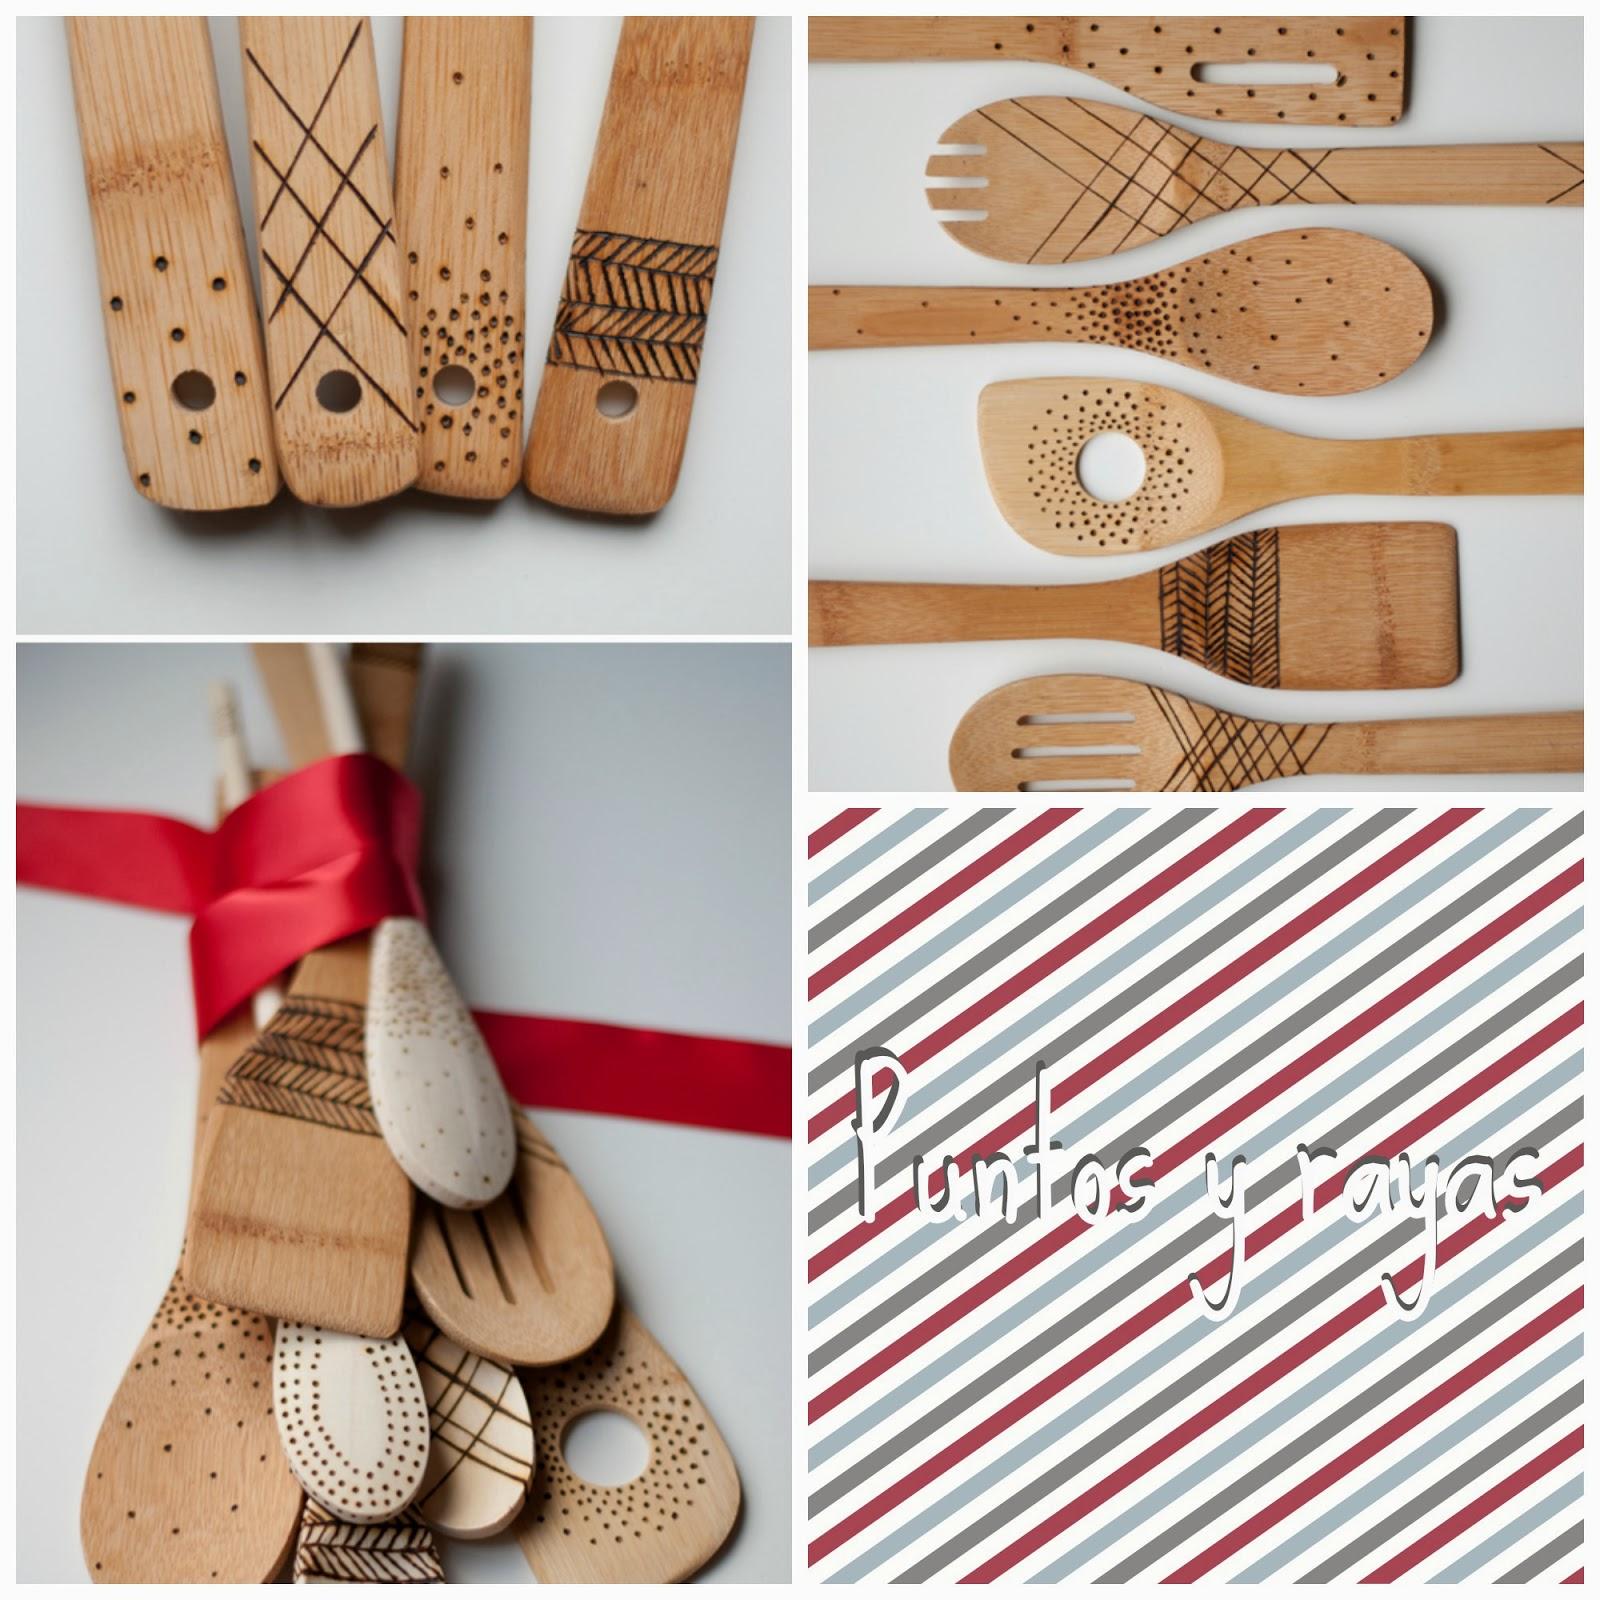 Miss lacraft no te quemes paletas de madera for Paletas de cocina decoradas